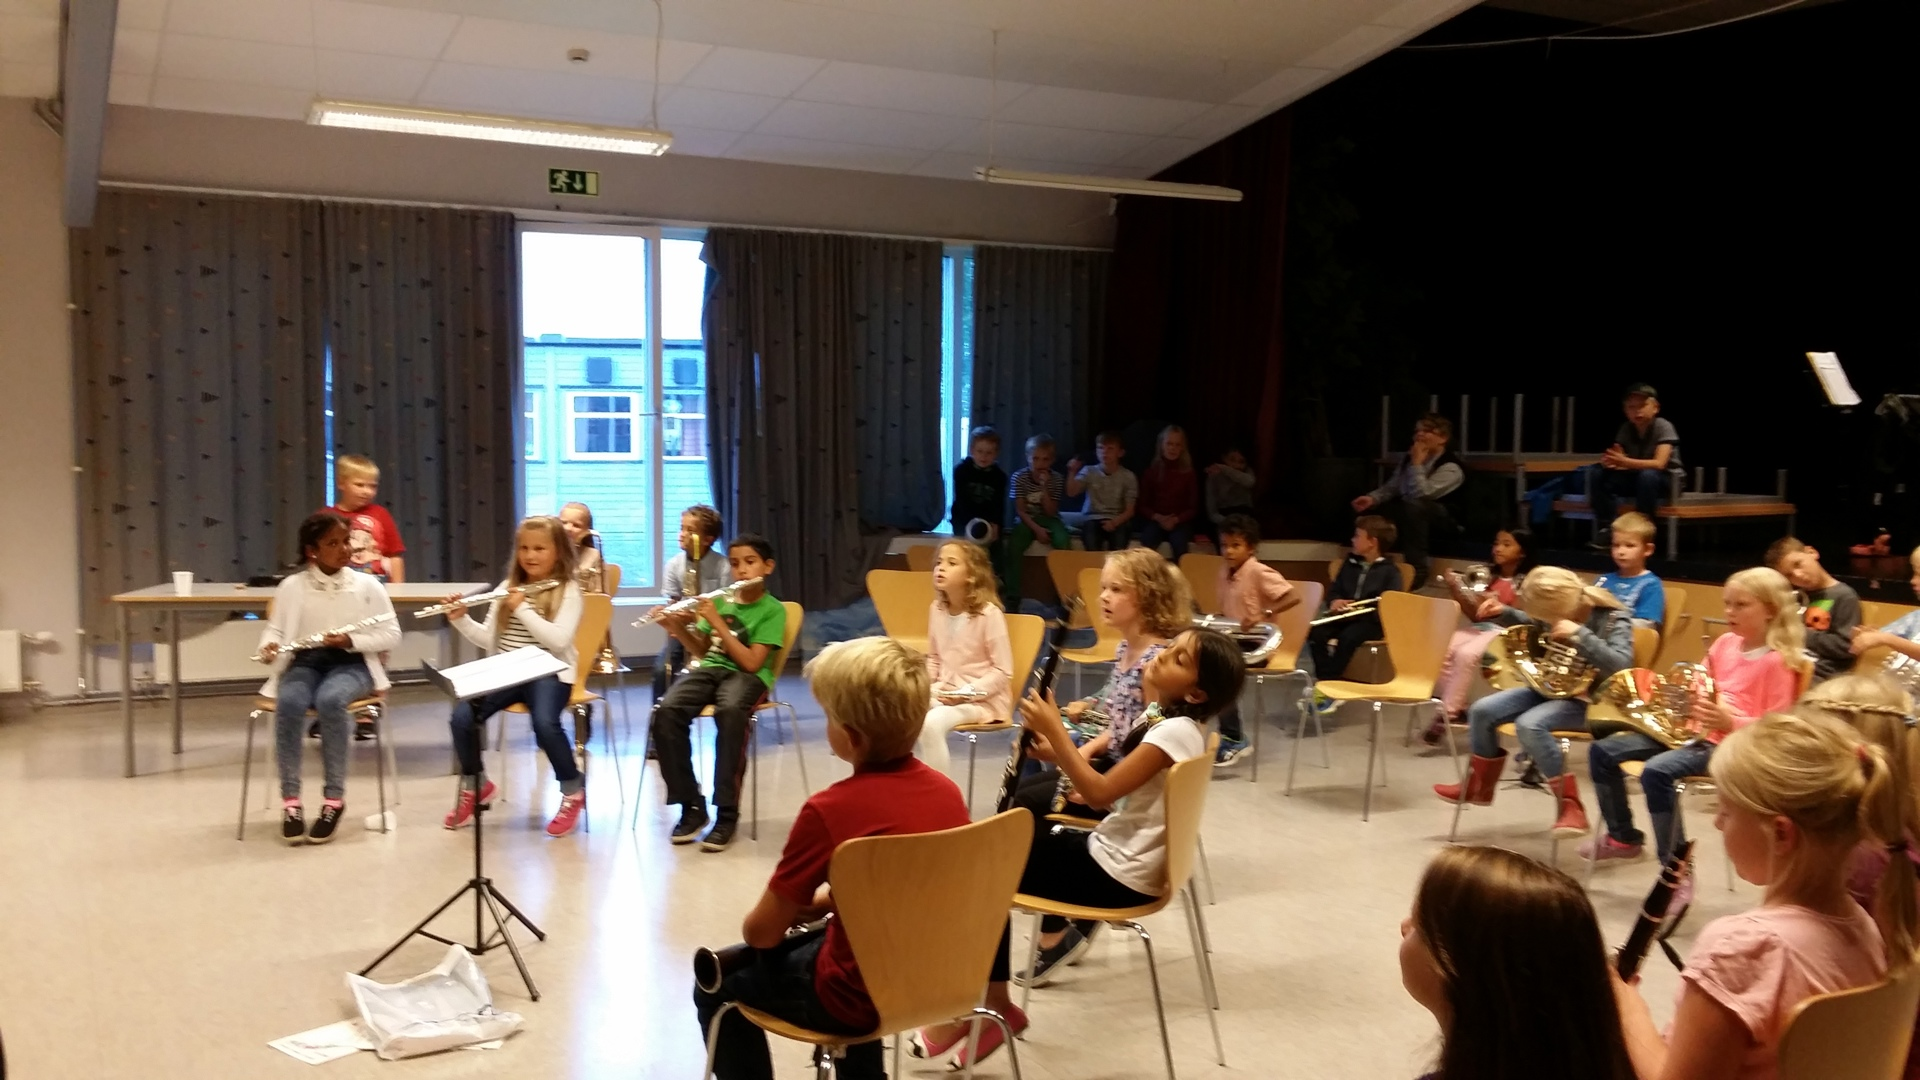 Nye aspiranter 27.08.2015 en-tone-konsert.jpg